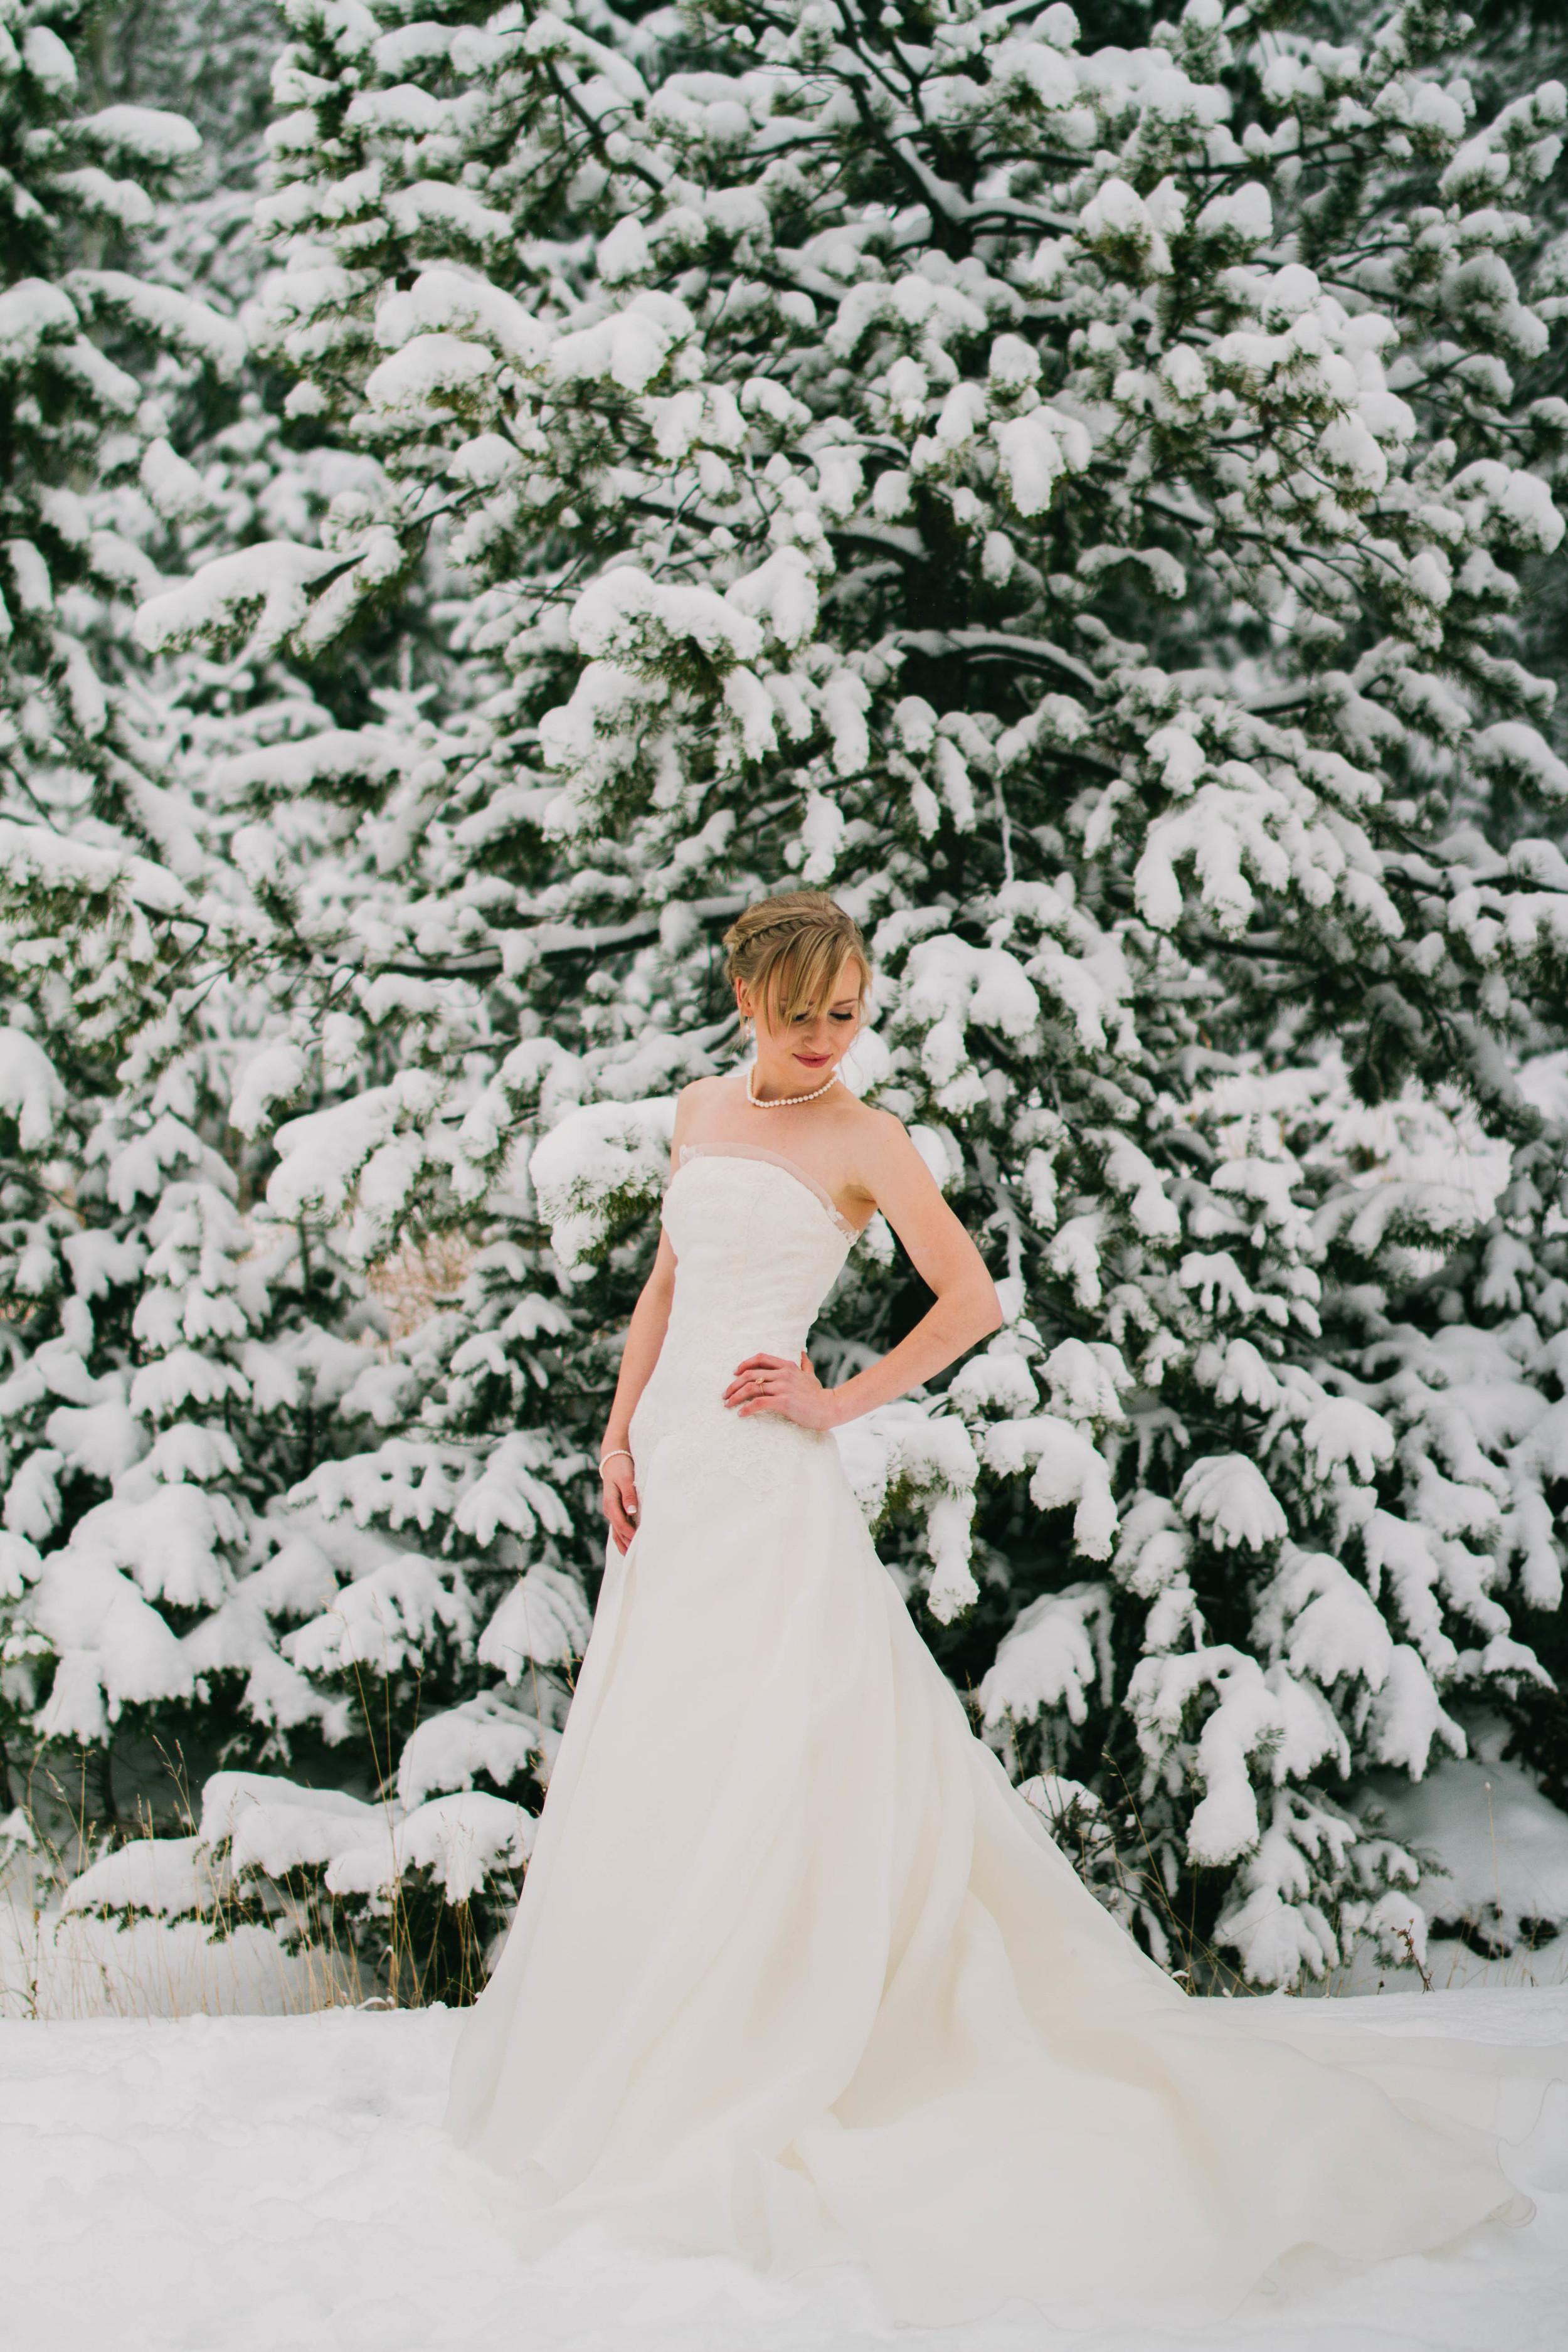 Bonin Wedding - Madeleine Bonin Photography-5821.jpg